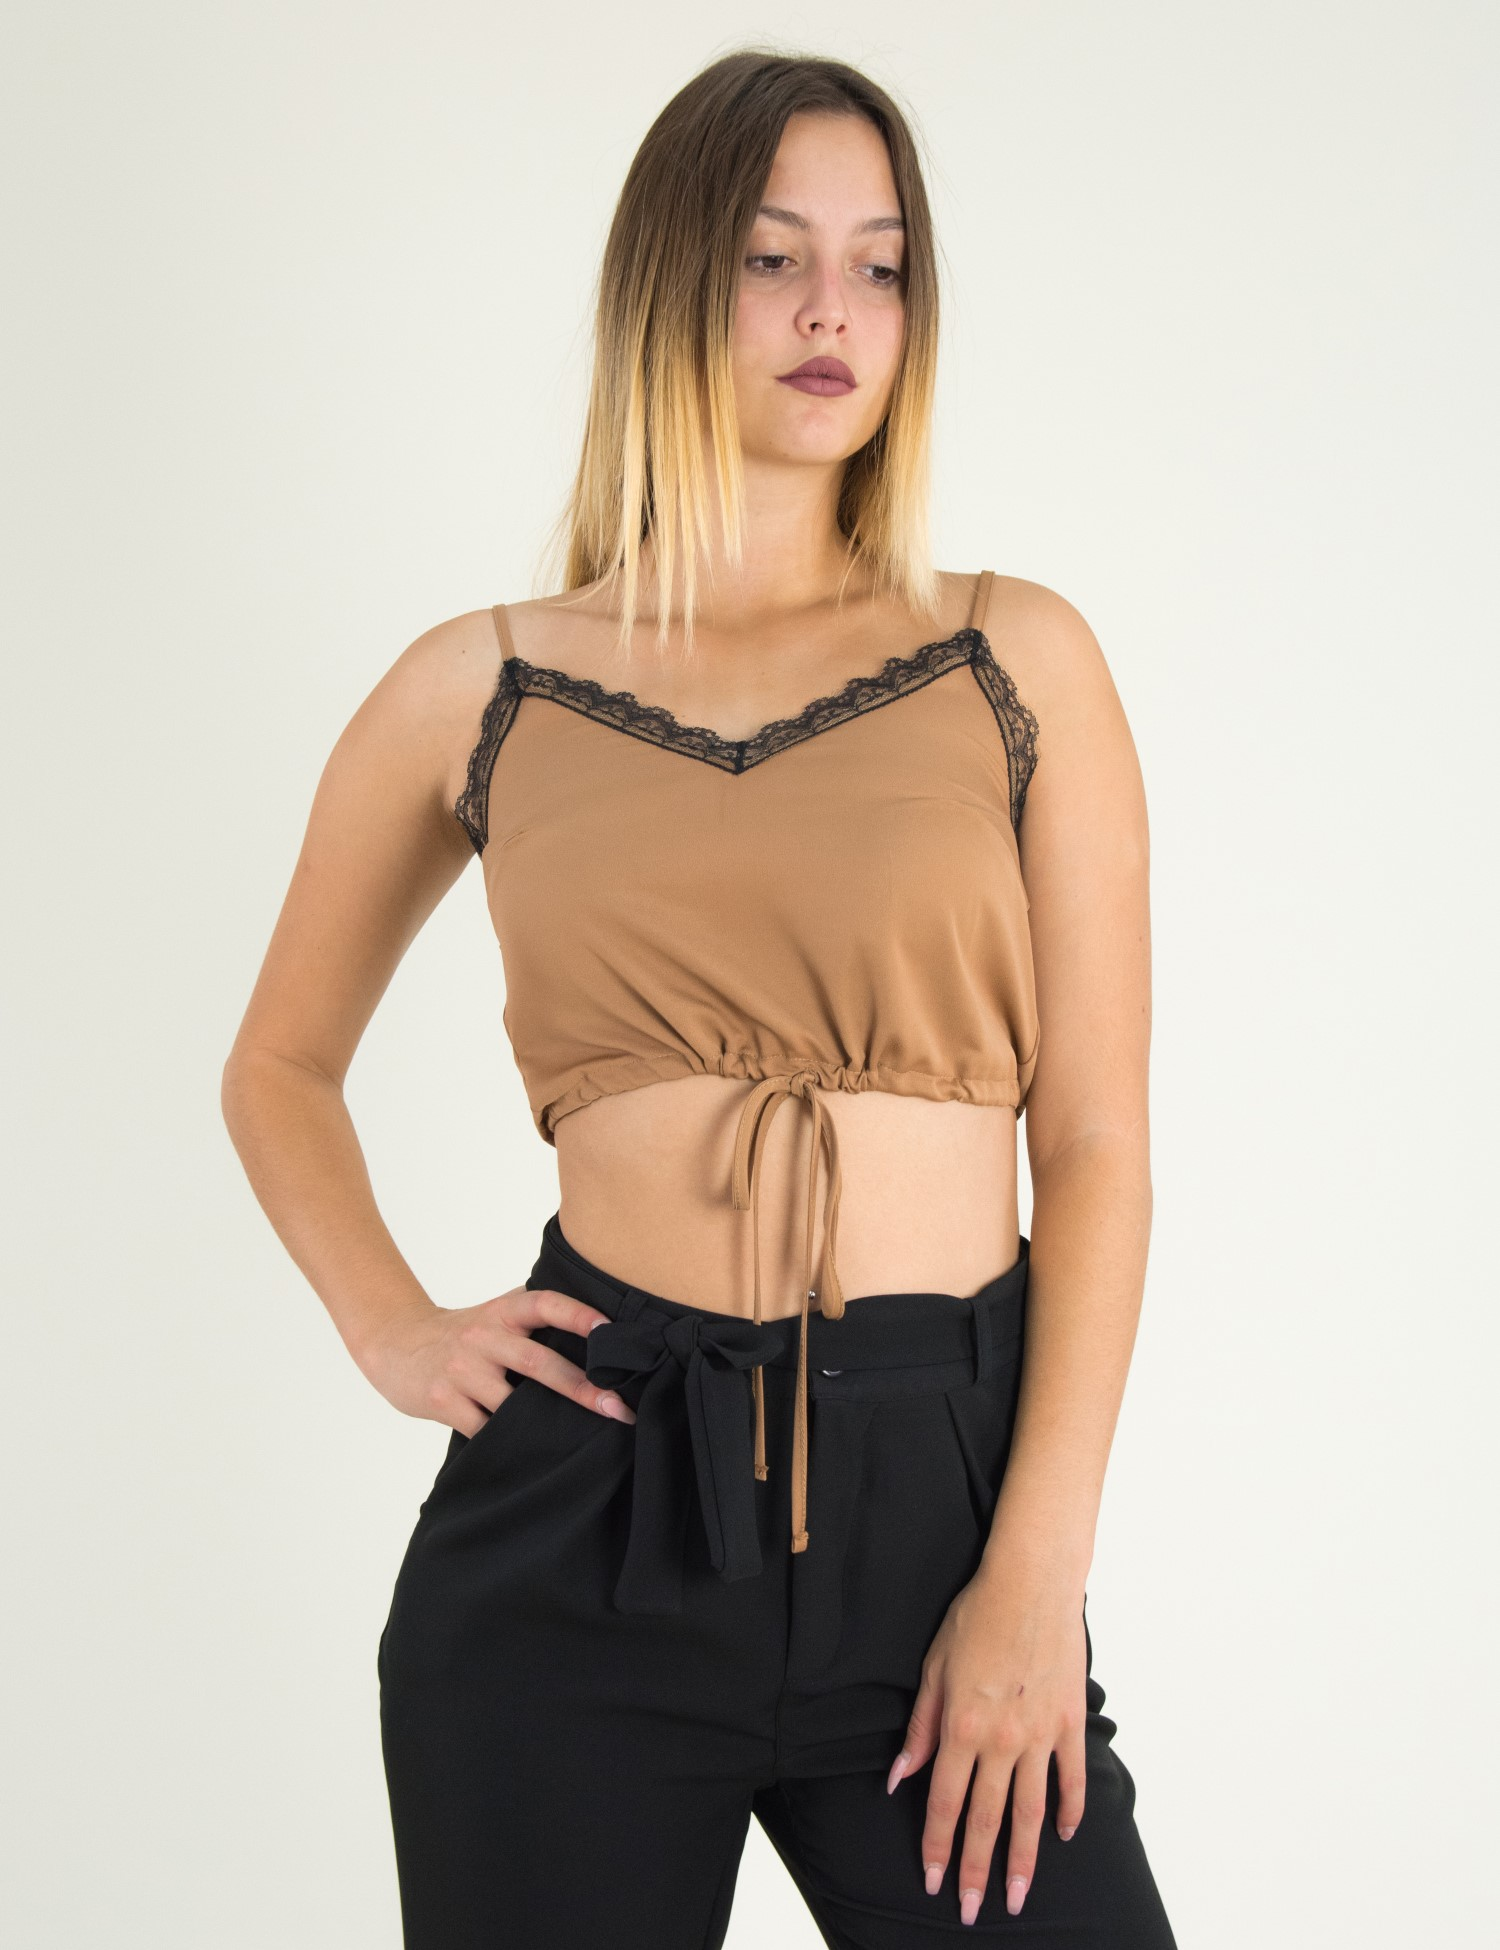 de046a3404a3 online αγορές μπλουζες με δαντελα bershka γυναικα γυναικεια ρουχα ...